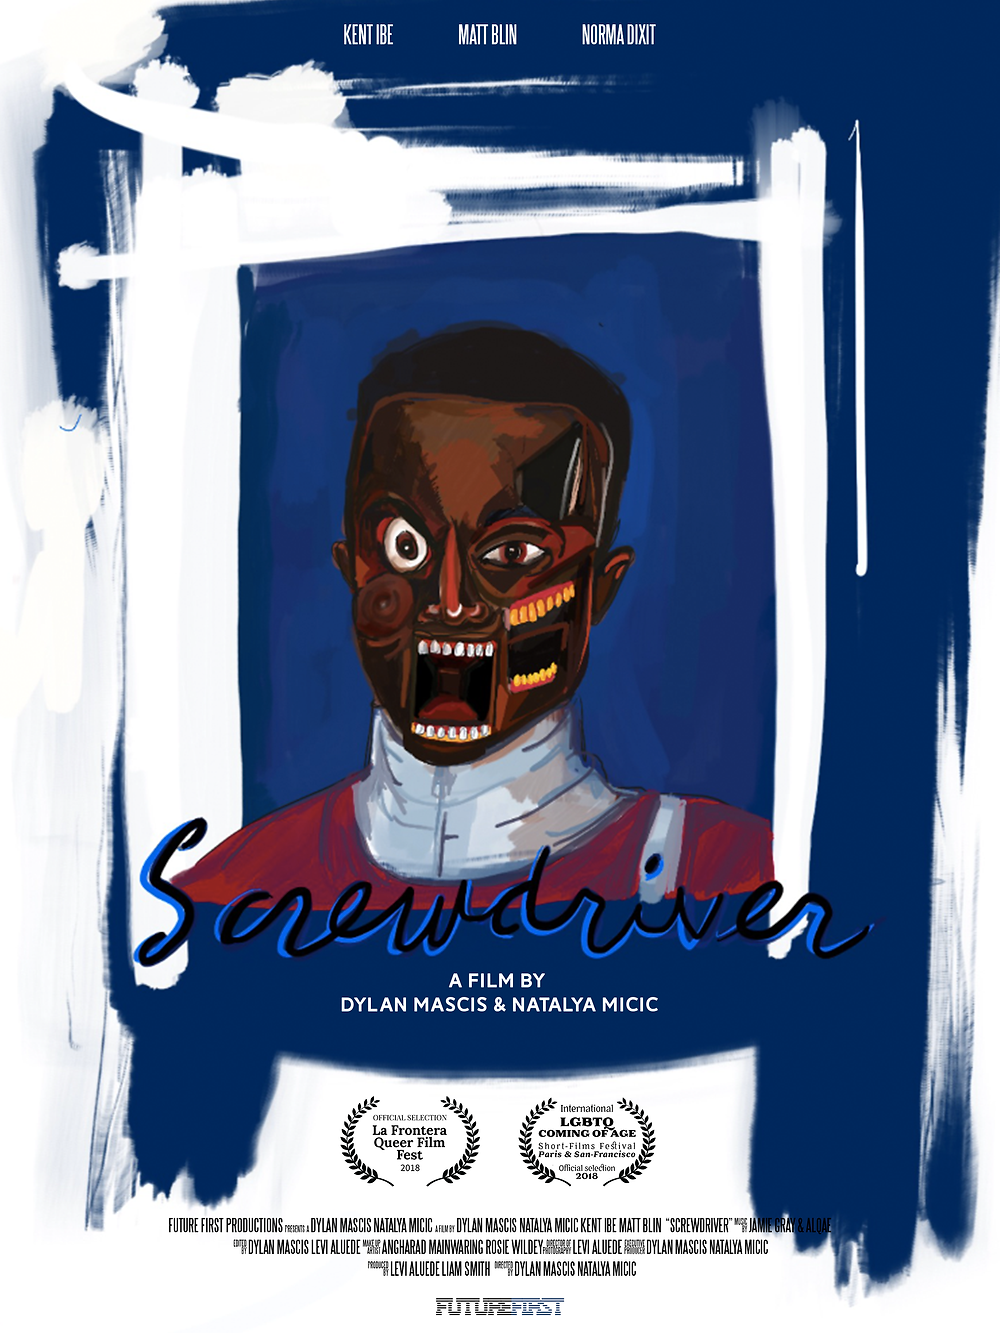 Screwdriver short film poster